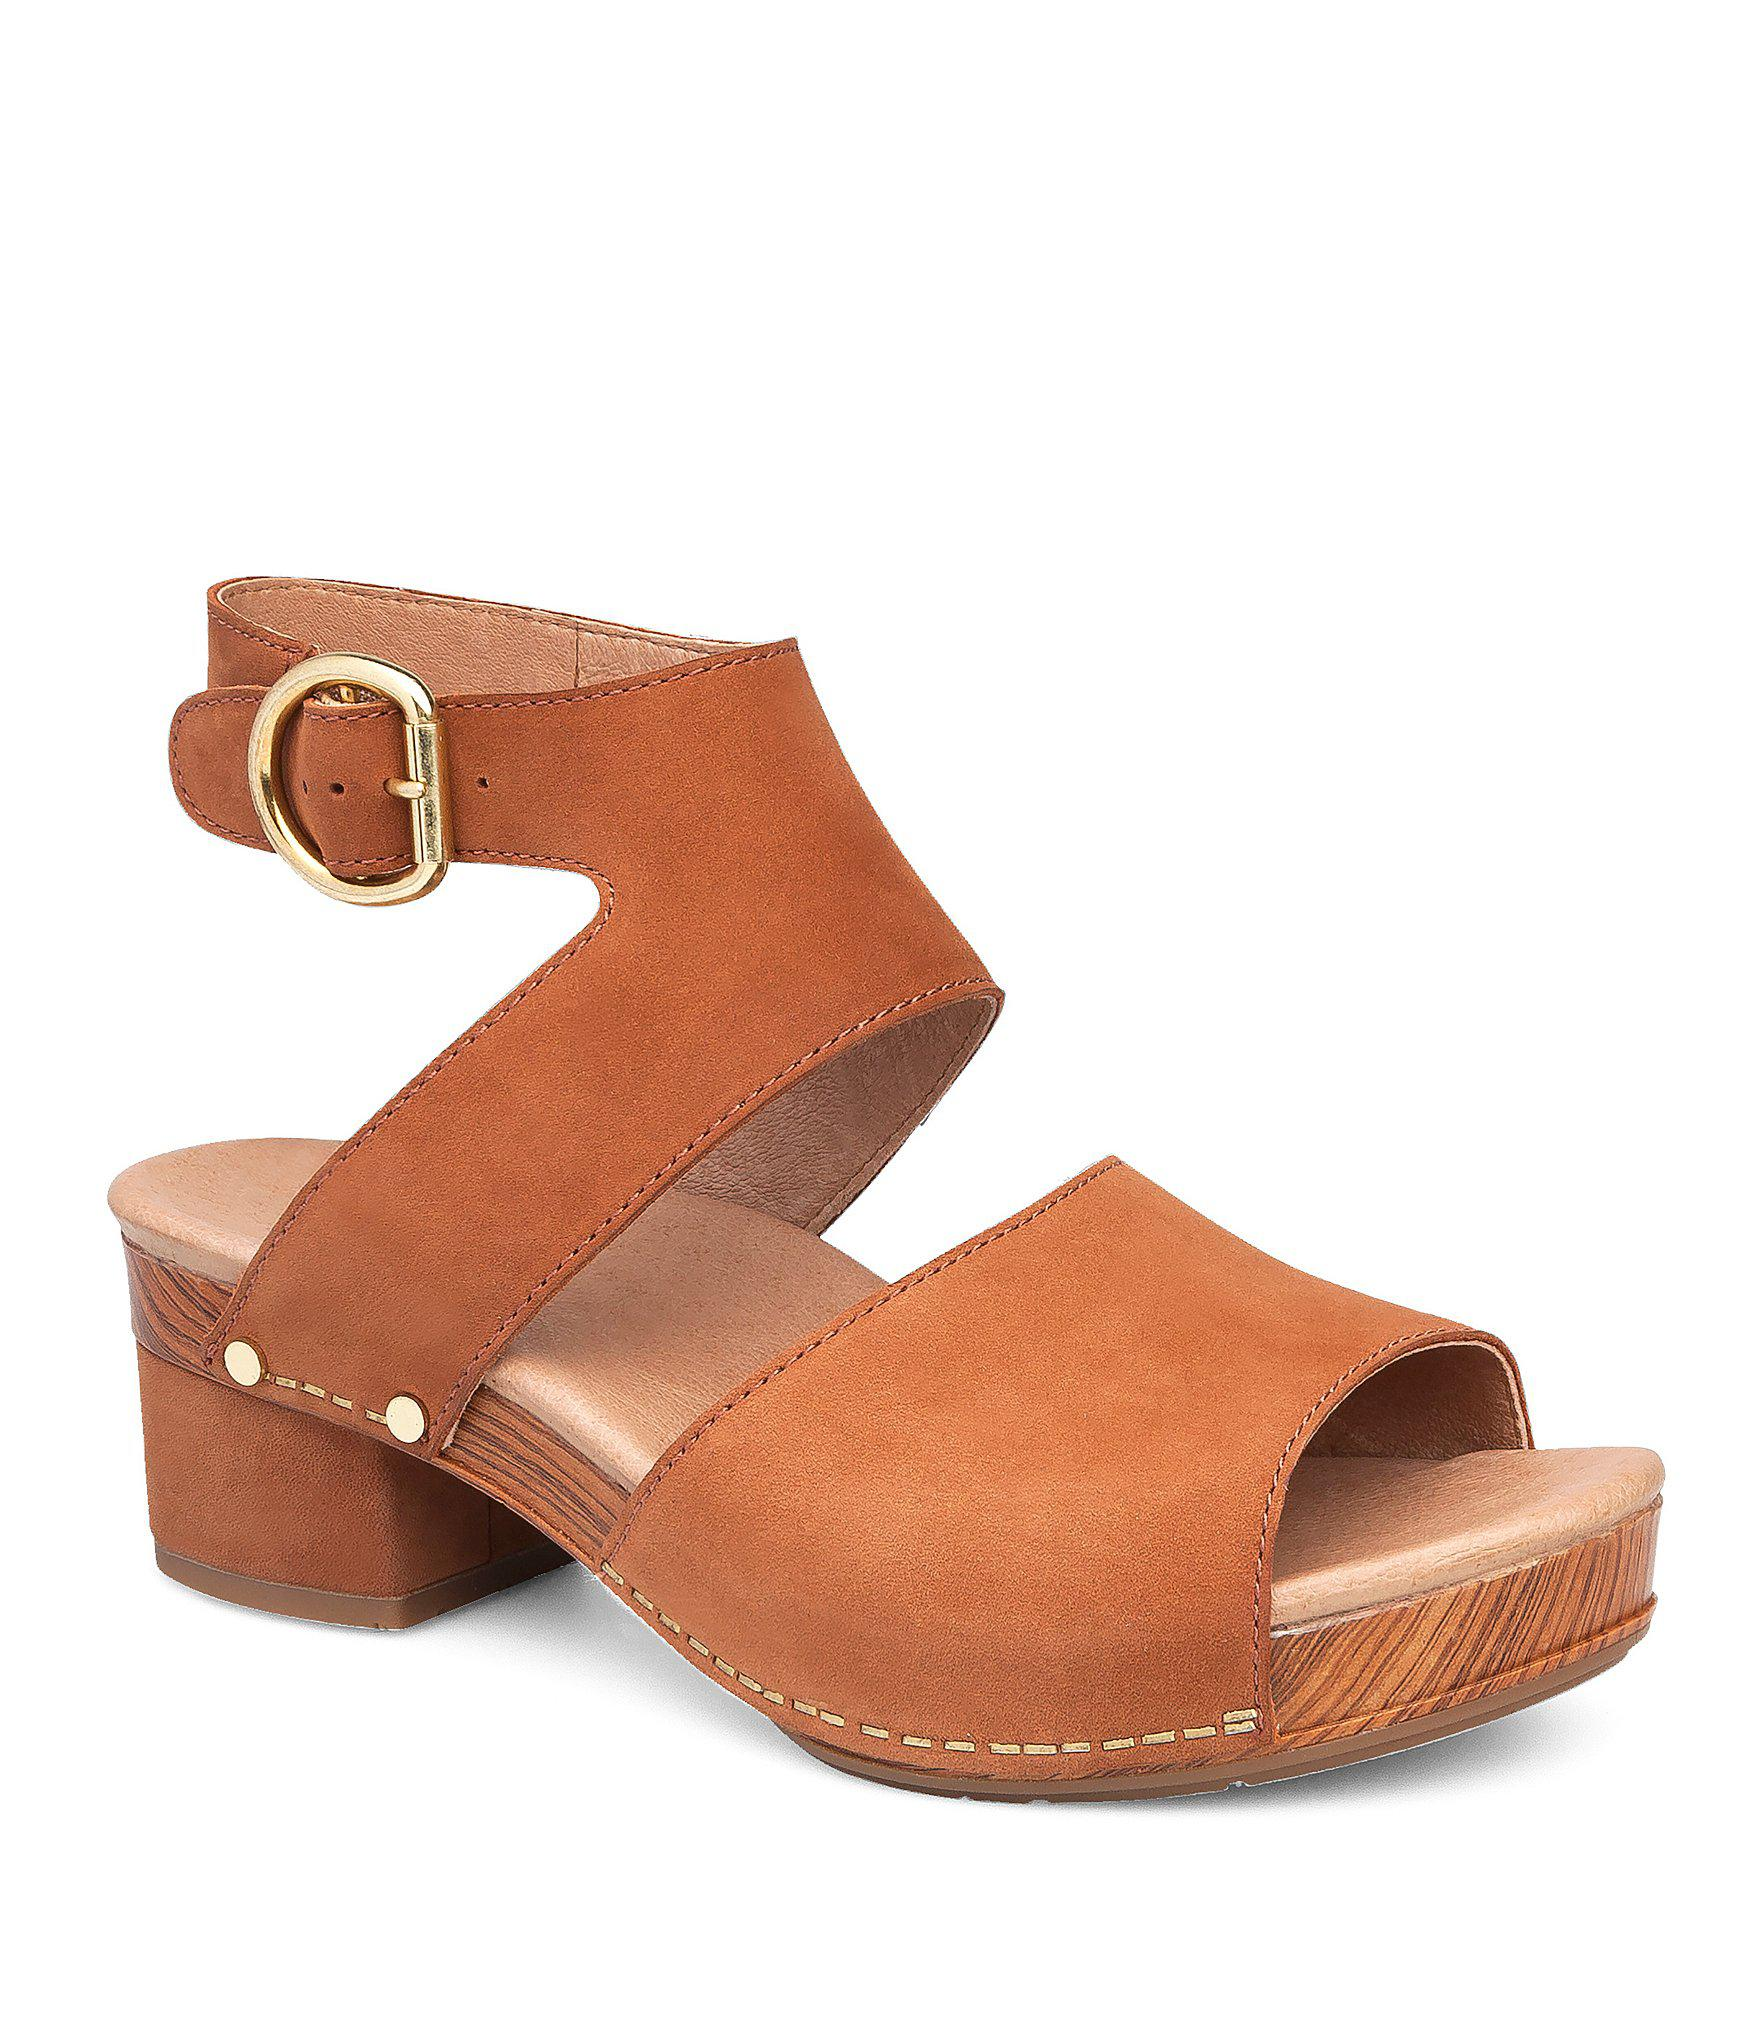 928aff5ff1c8 Lyst - Dansko Minka Nubuck Sandals in Brown